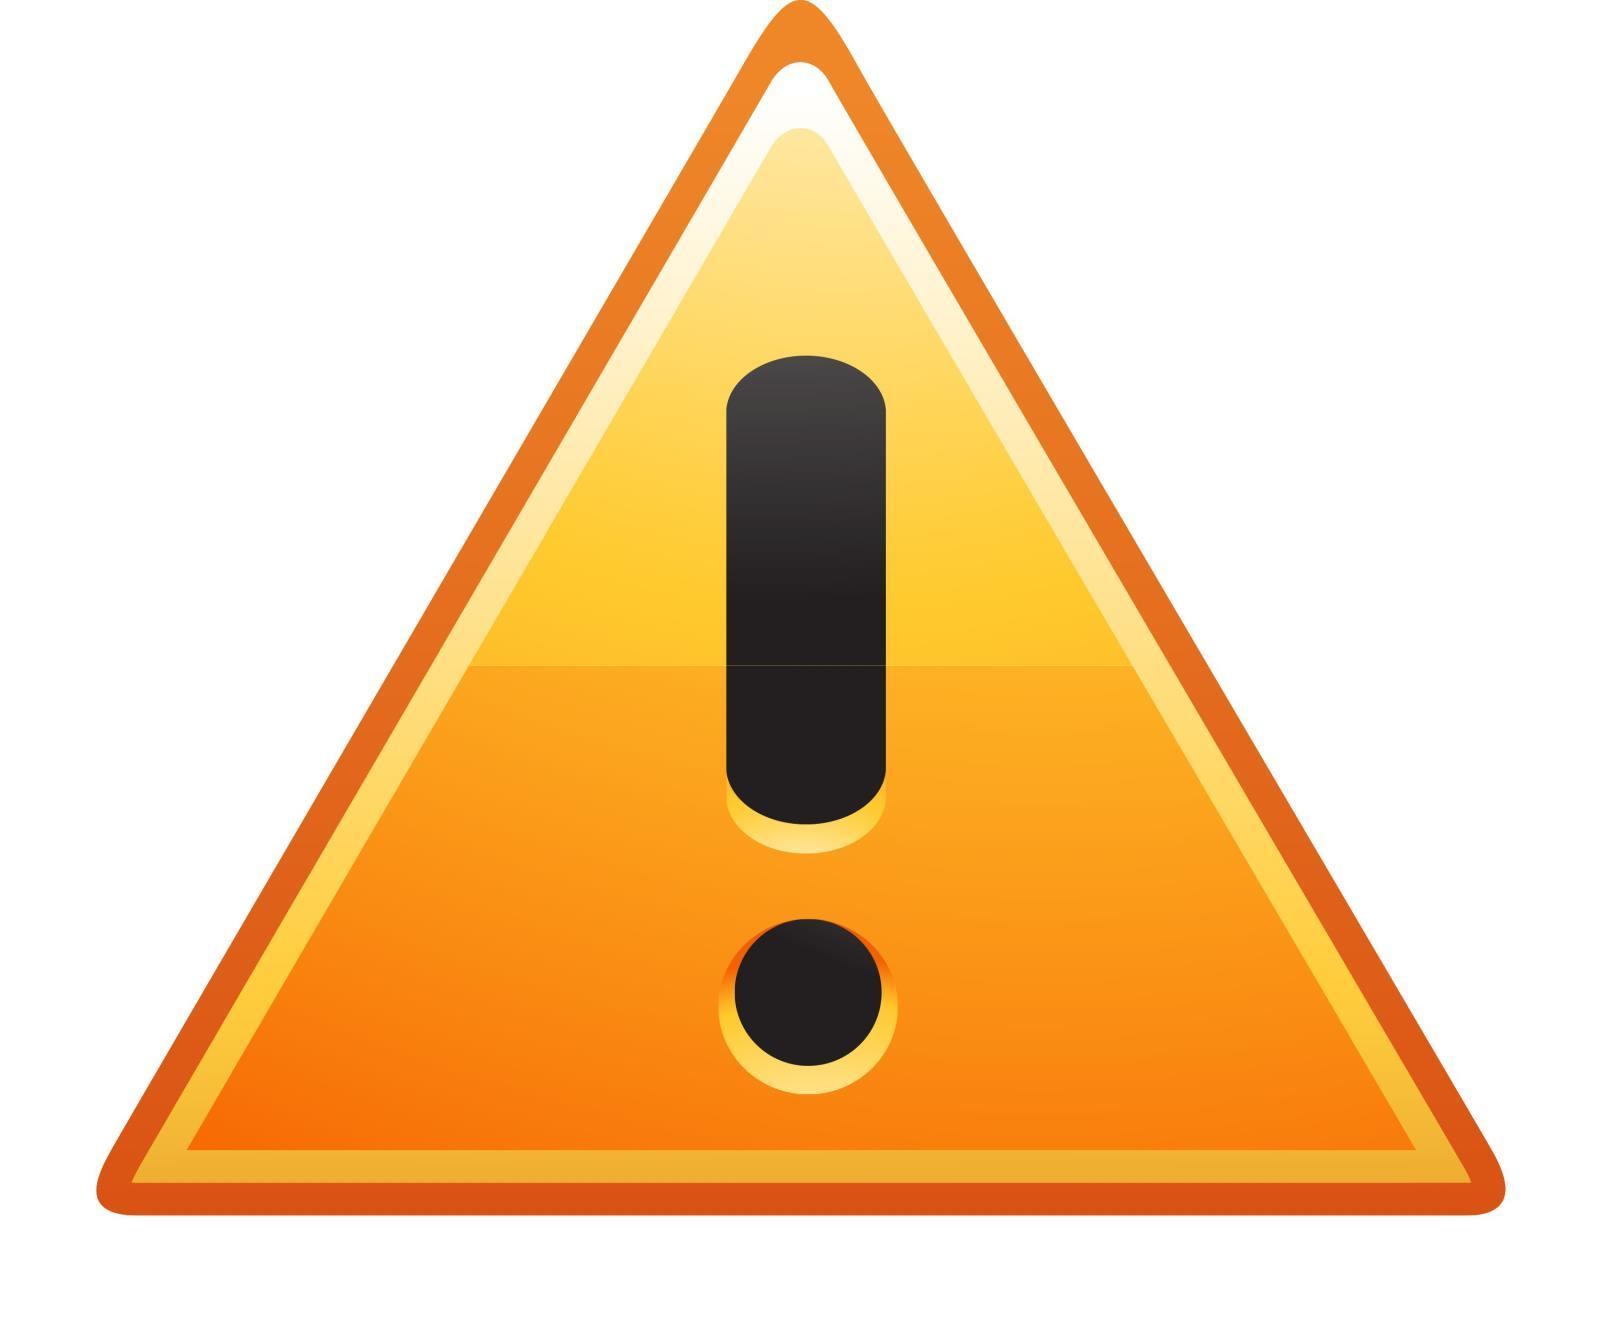 caution-alert_fJDhDLLO_L